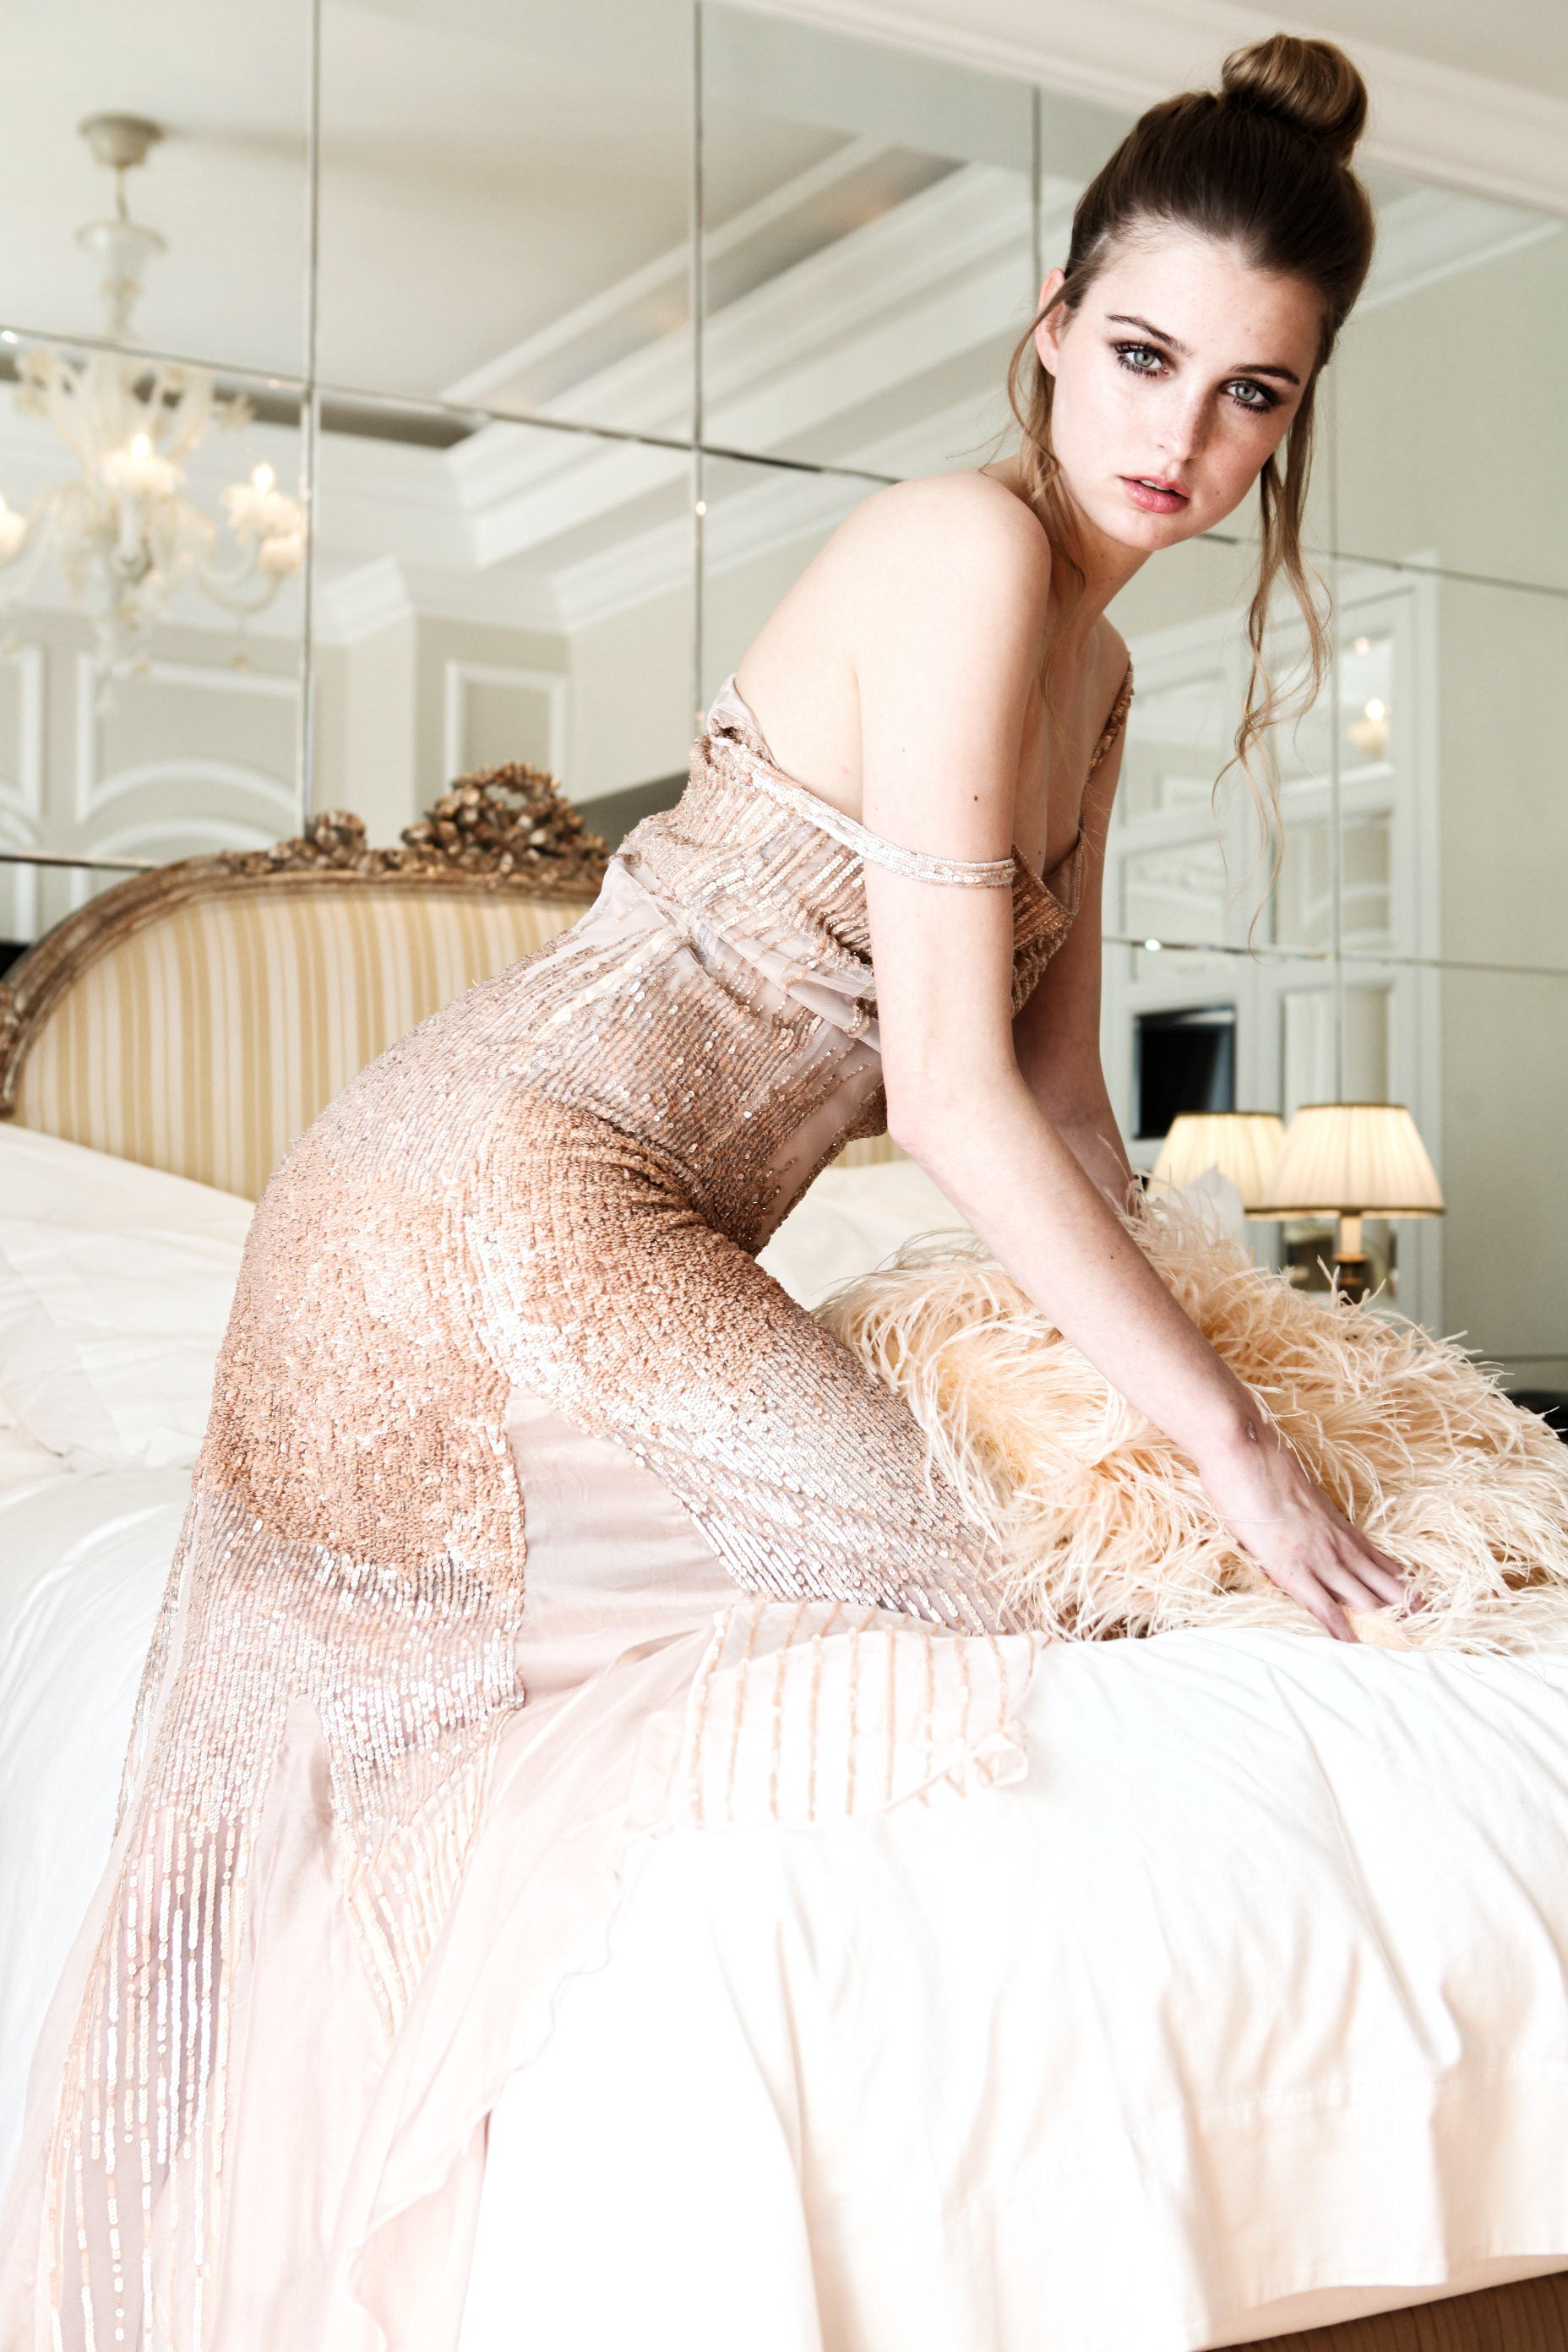 Photo Credits Fashion: Mara Desypris / Stylist: Michael Pandos / Make up: Dimitris Dimitroulis / Hair: Aldo Memetai